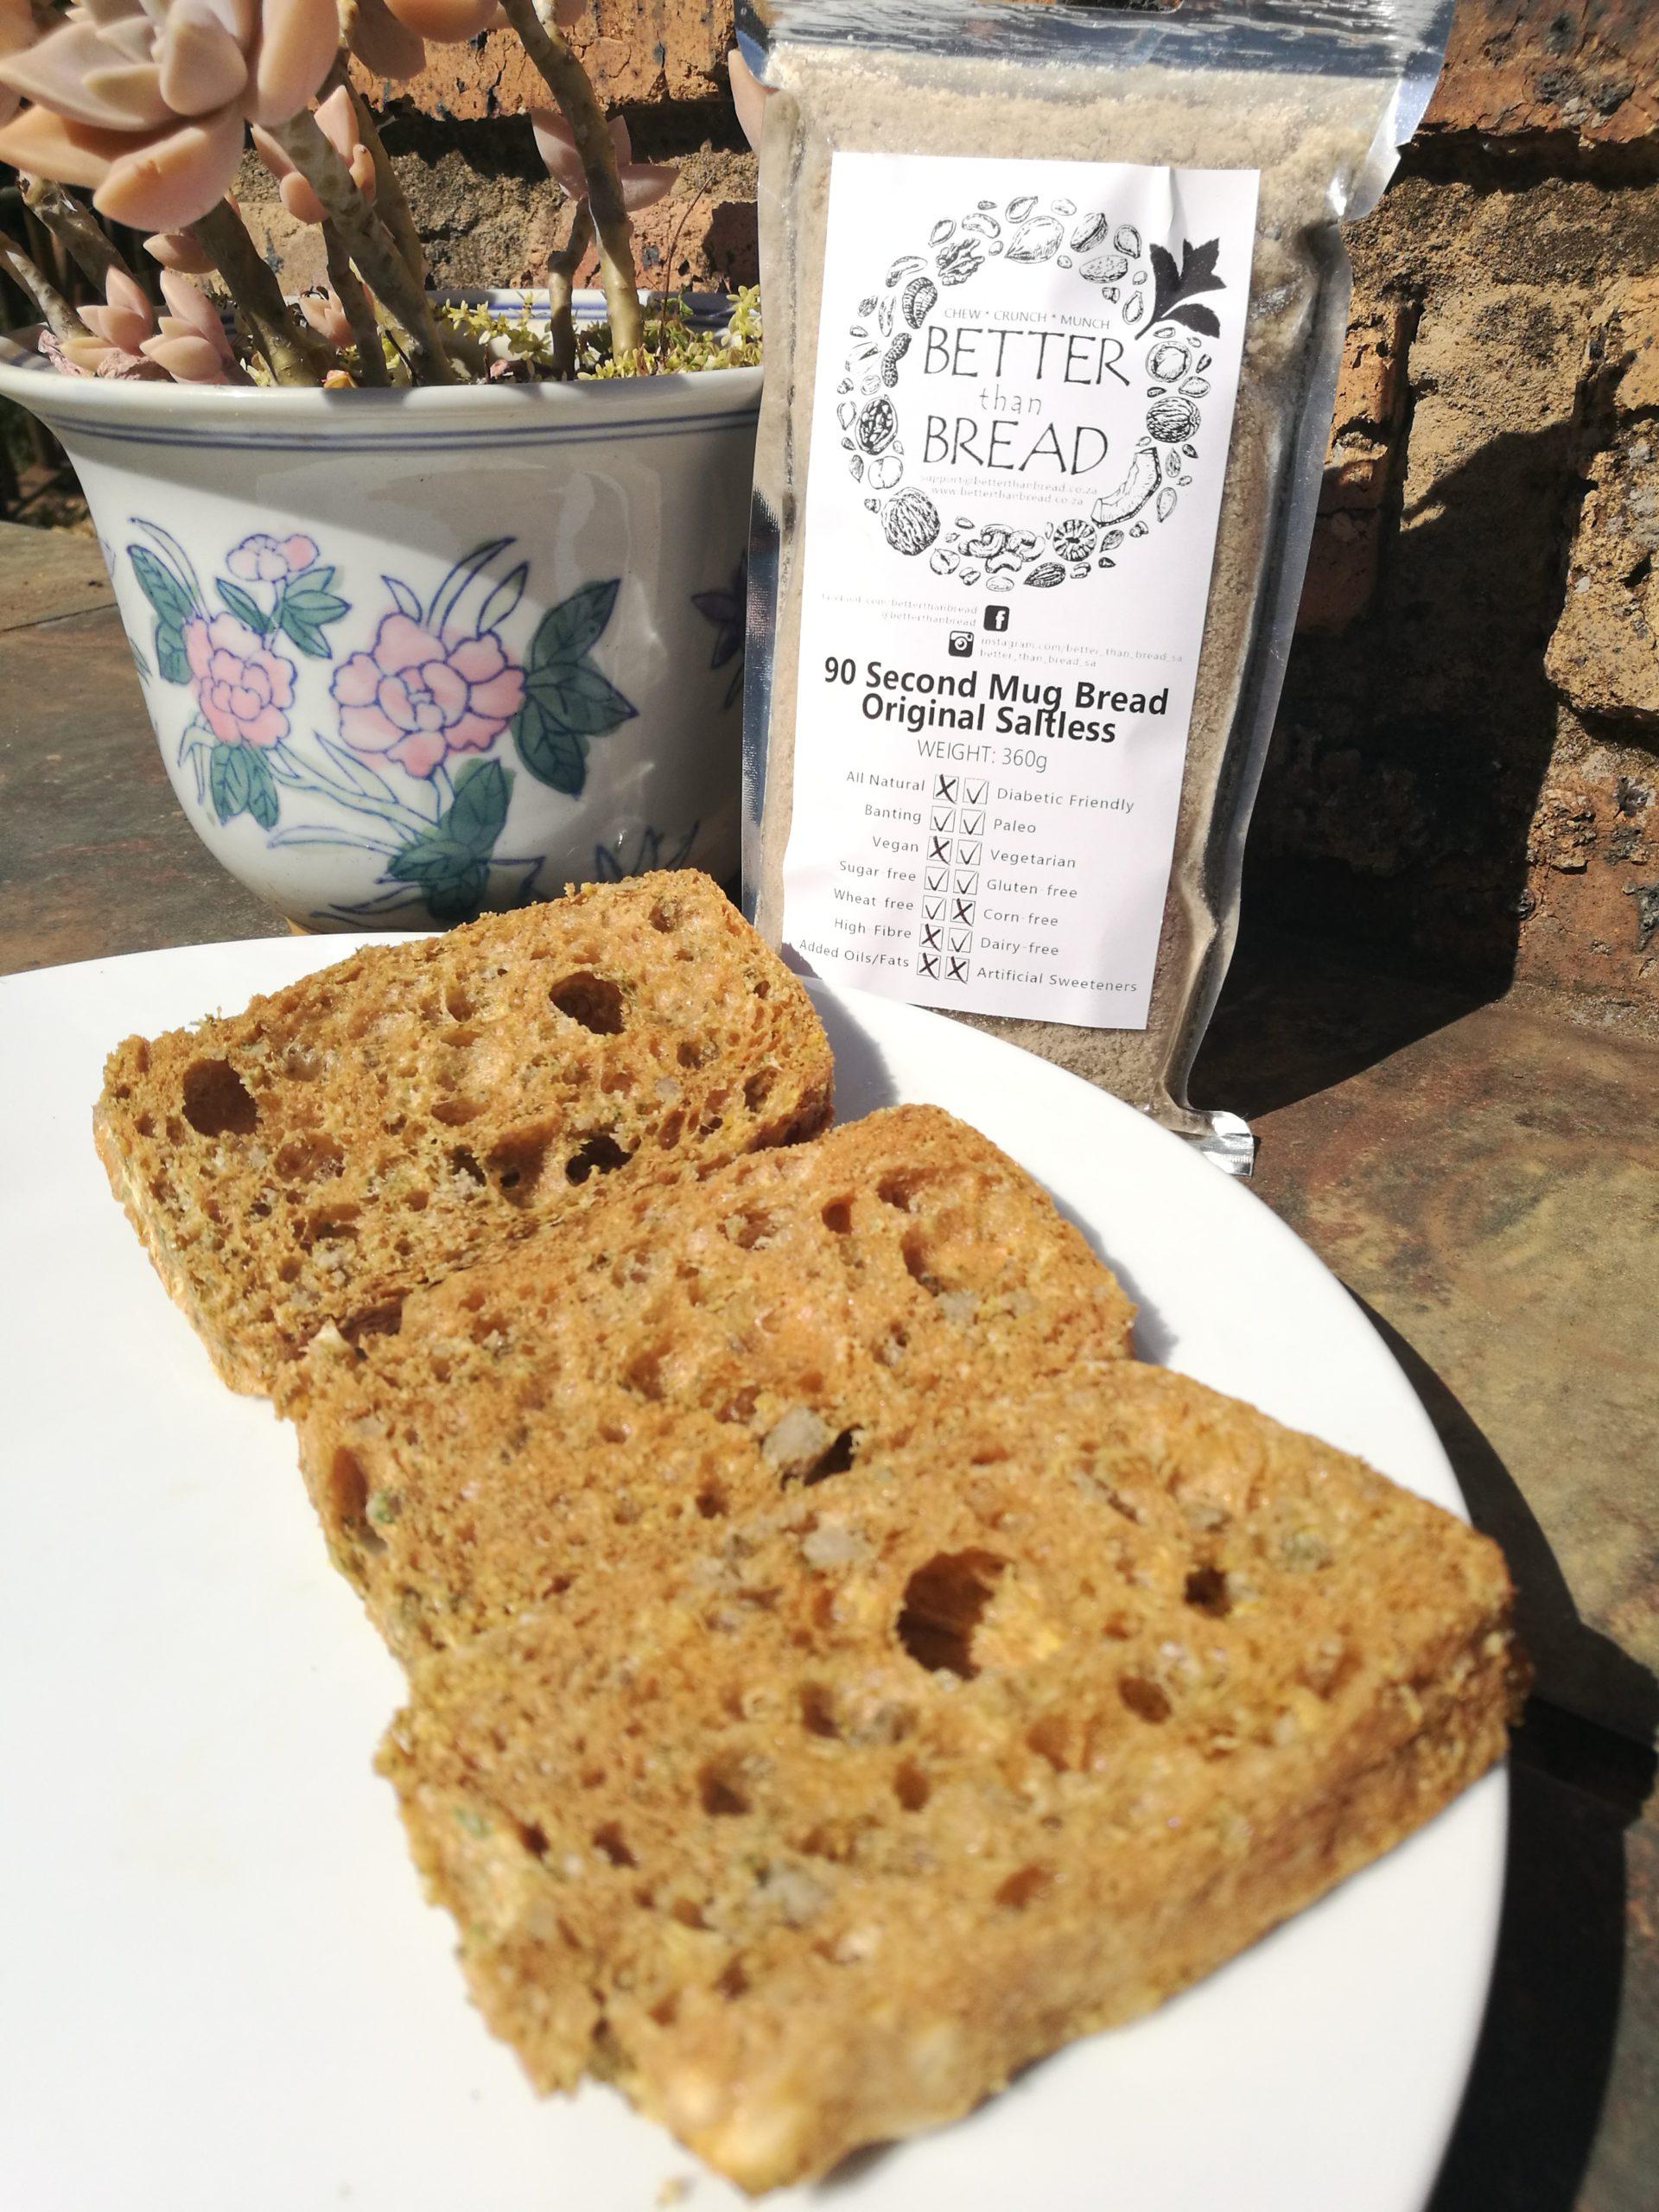 Better Than Bread - Bare 90 Second Mug Bread